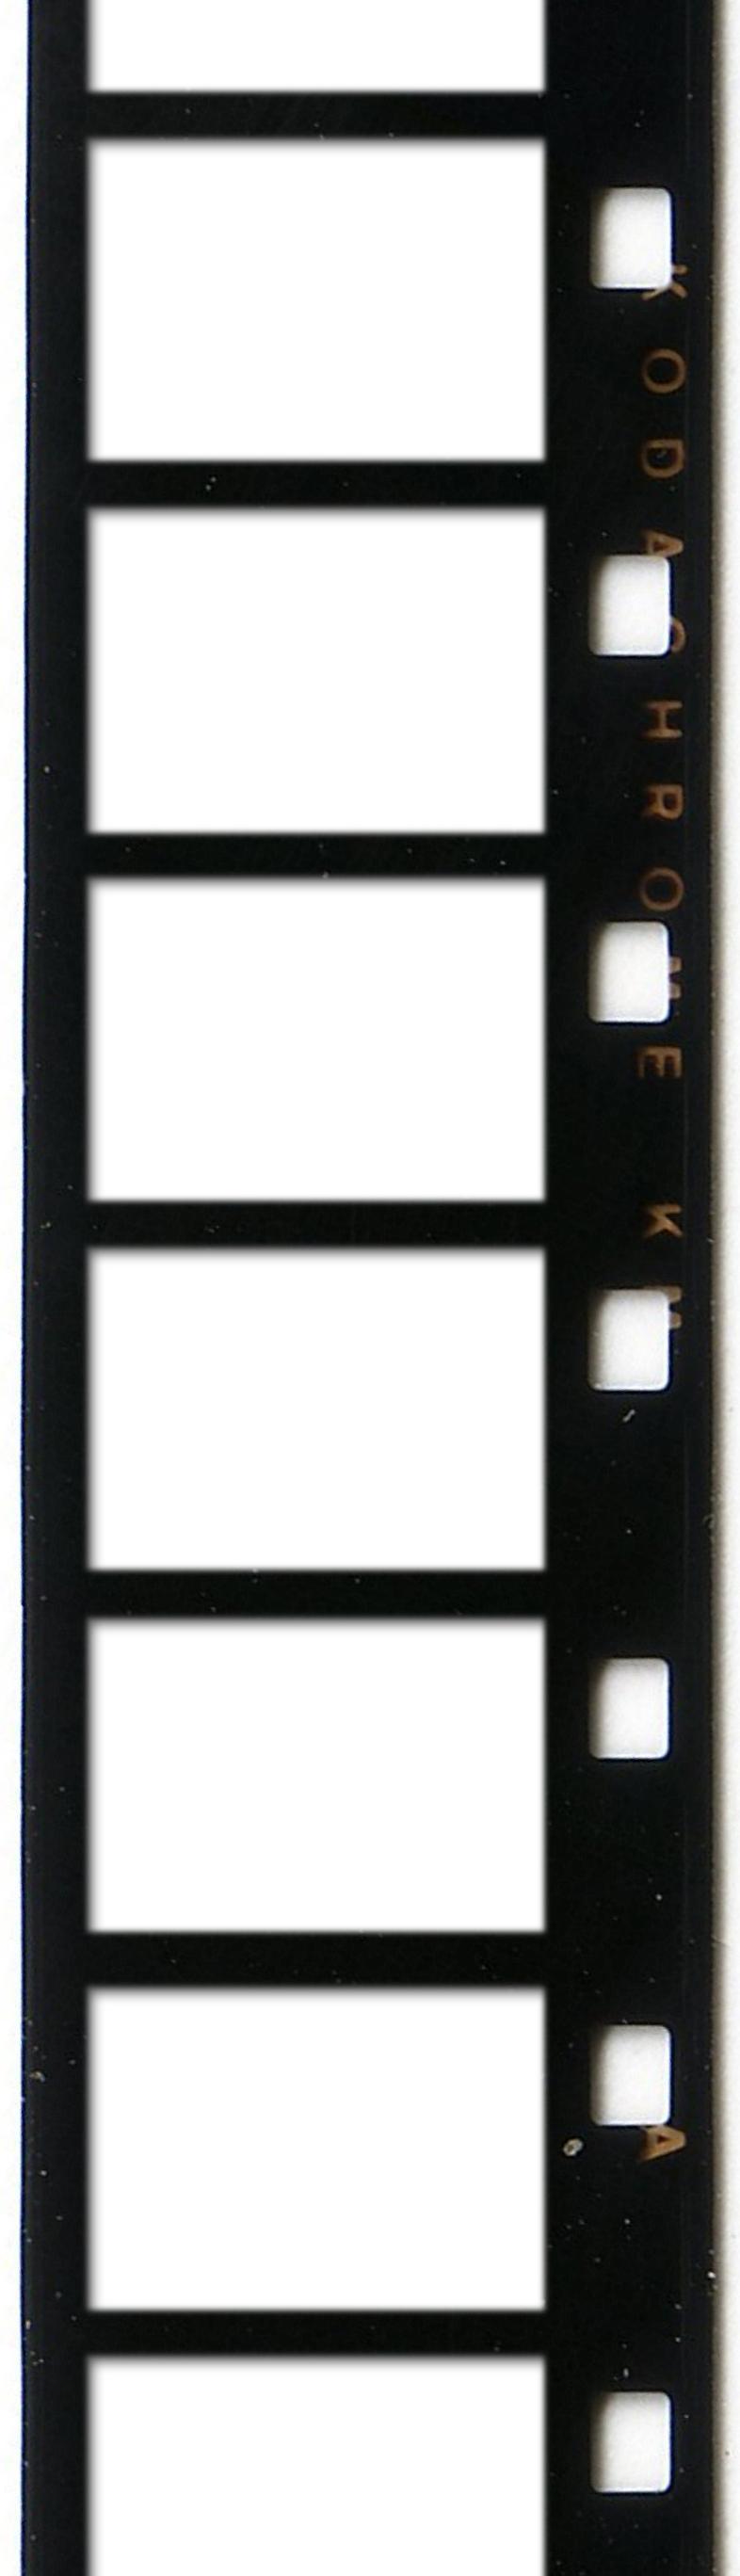 kodachrome super8 film texture by cherryvinyl on deviantart. Black Bedroom Furniture Sets. Home Design Ideas